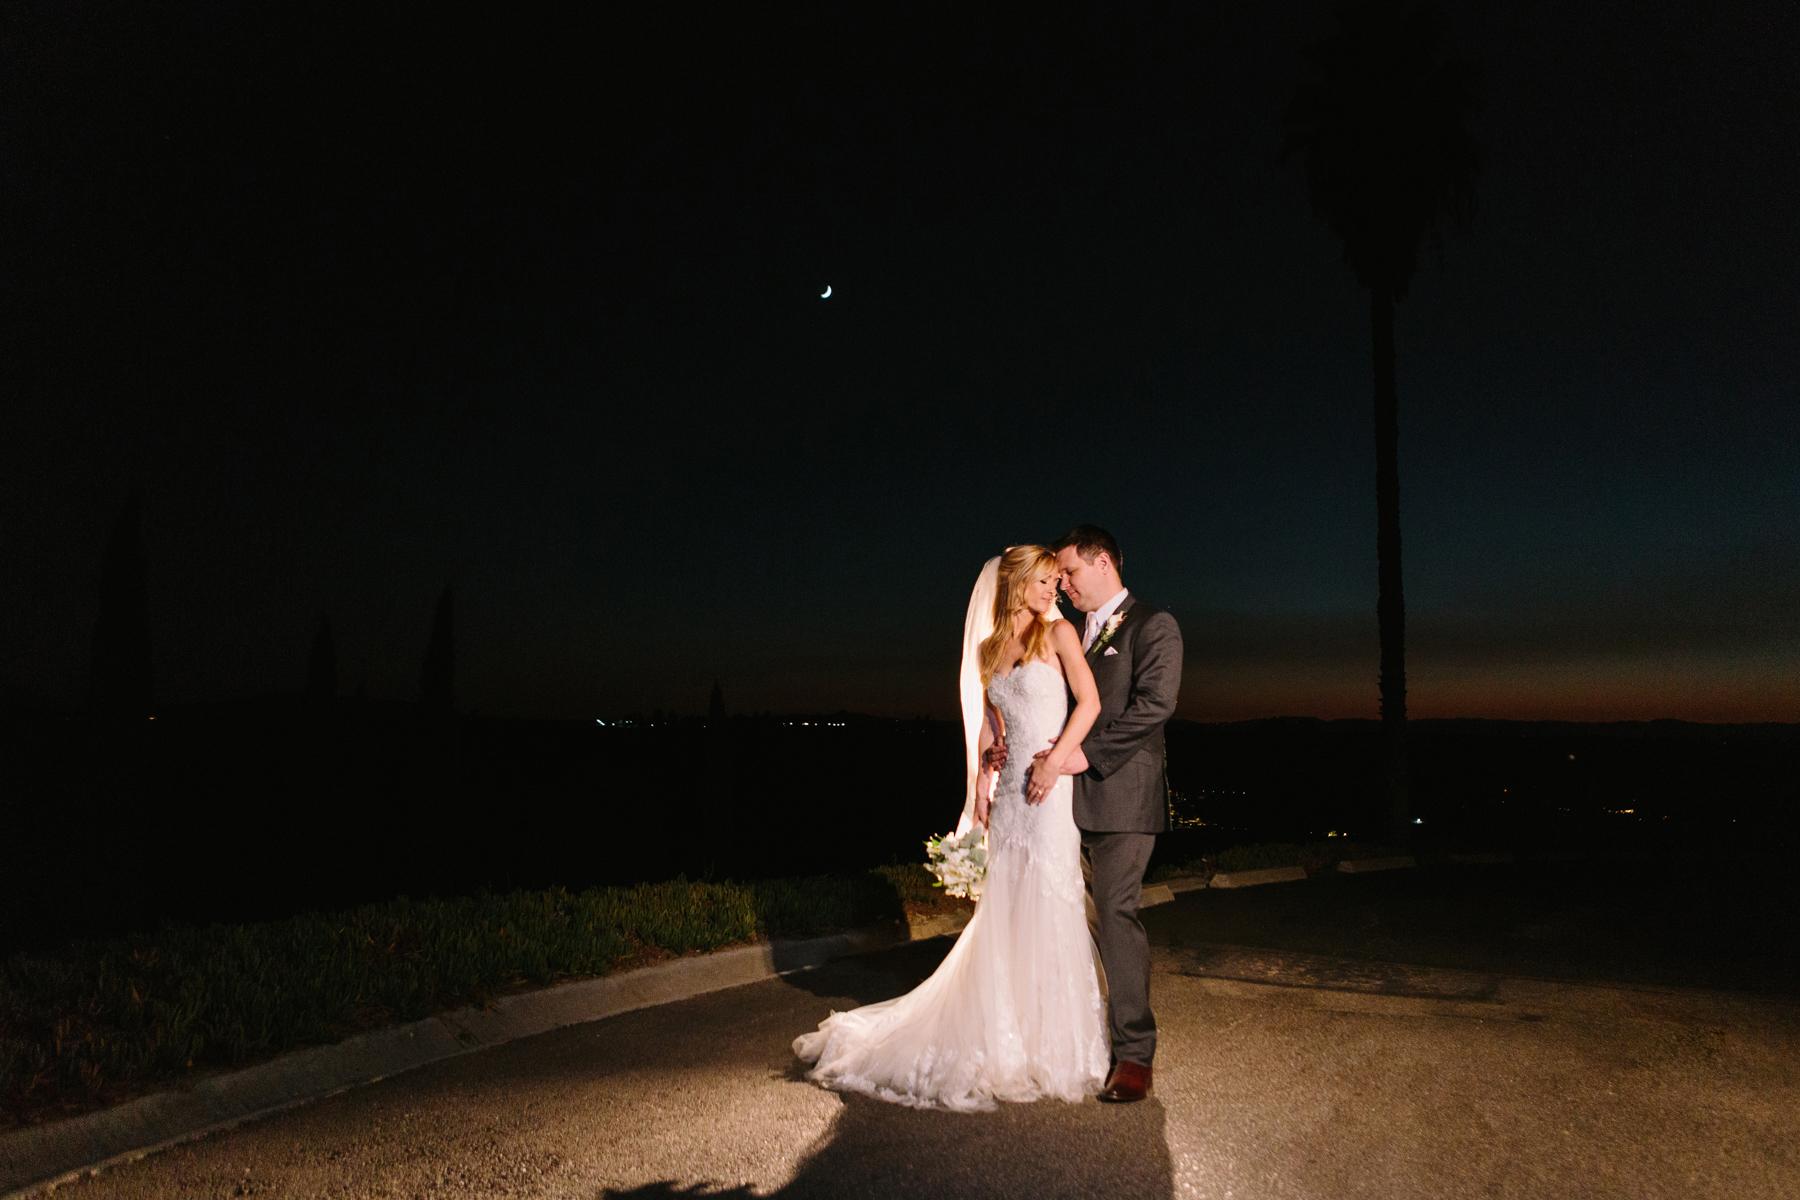 Orange-County-Wedding-Photography-Brianna-Caster-and-Co-Photographers-Falkner-Winery-Wedding-16